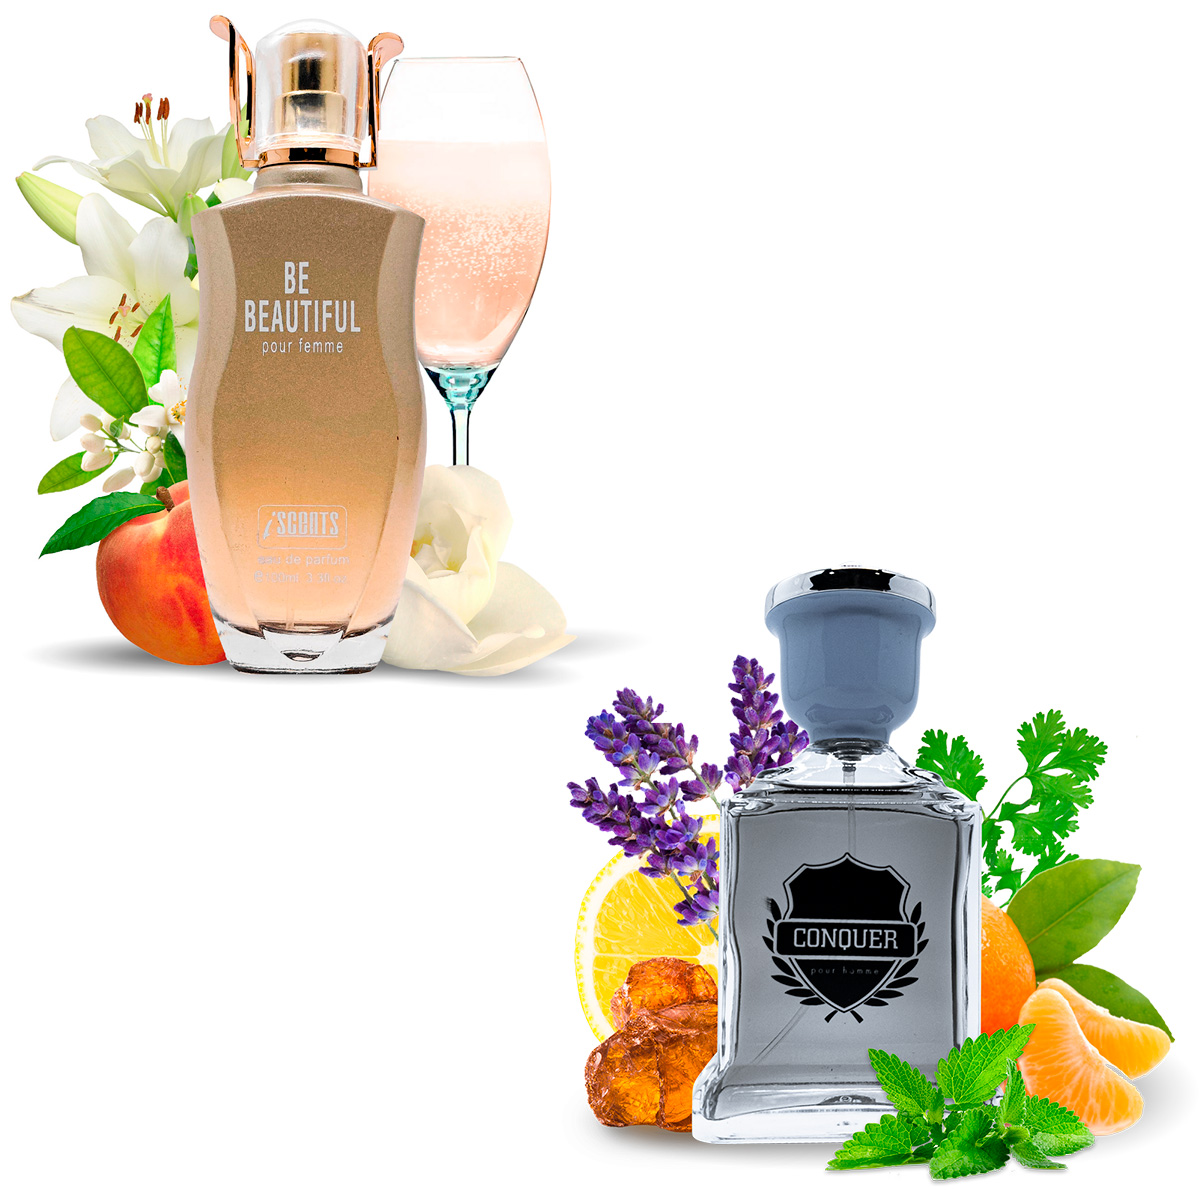 Kit 2 Perfumes Importados Be Beautiful e Conquer I Scents